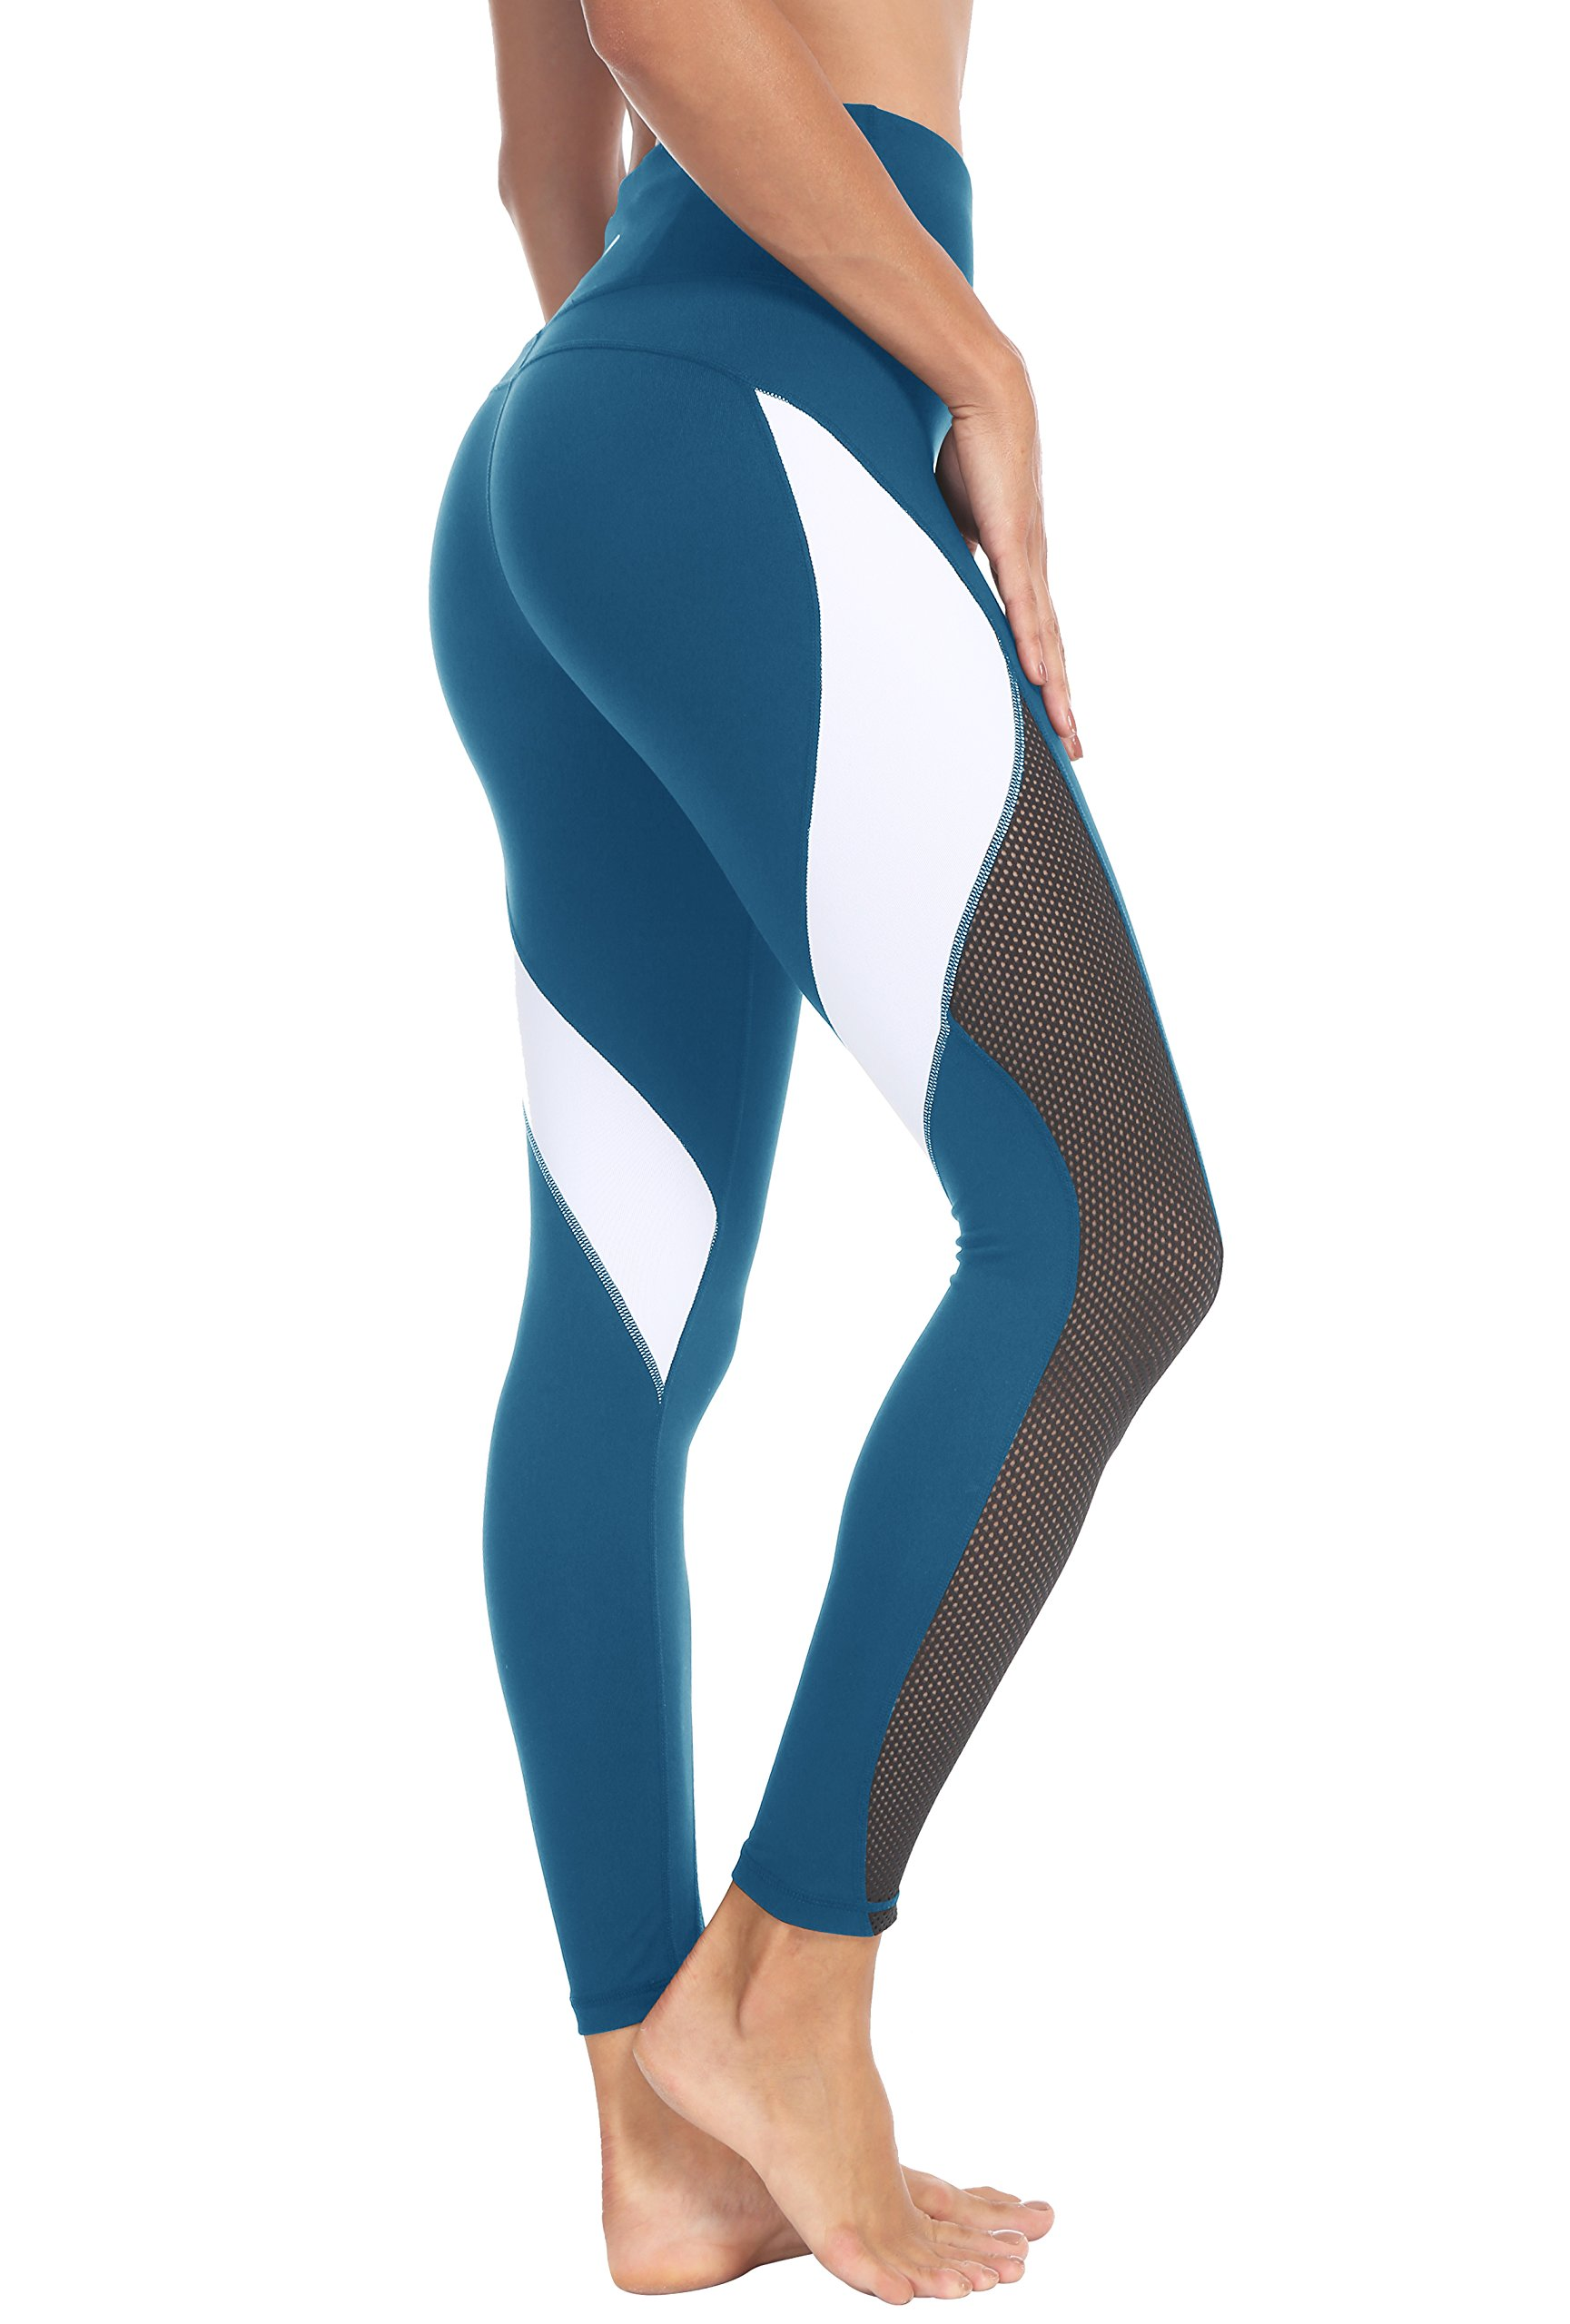 Queenie Ke Women Yoga Pants Color Blocking Mesh Workout Running Leggings Tights Size XXL Color Dark Blue